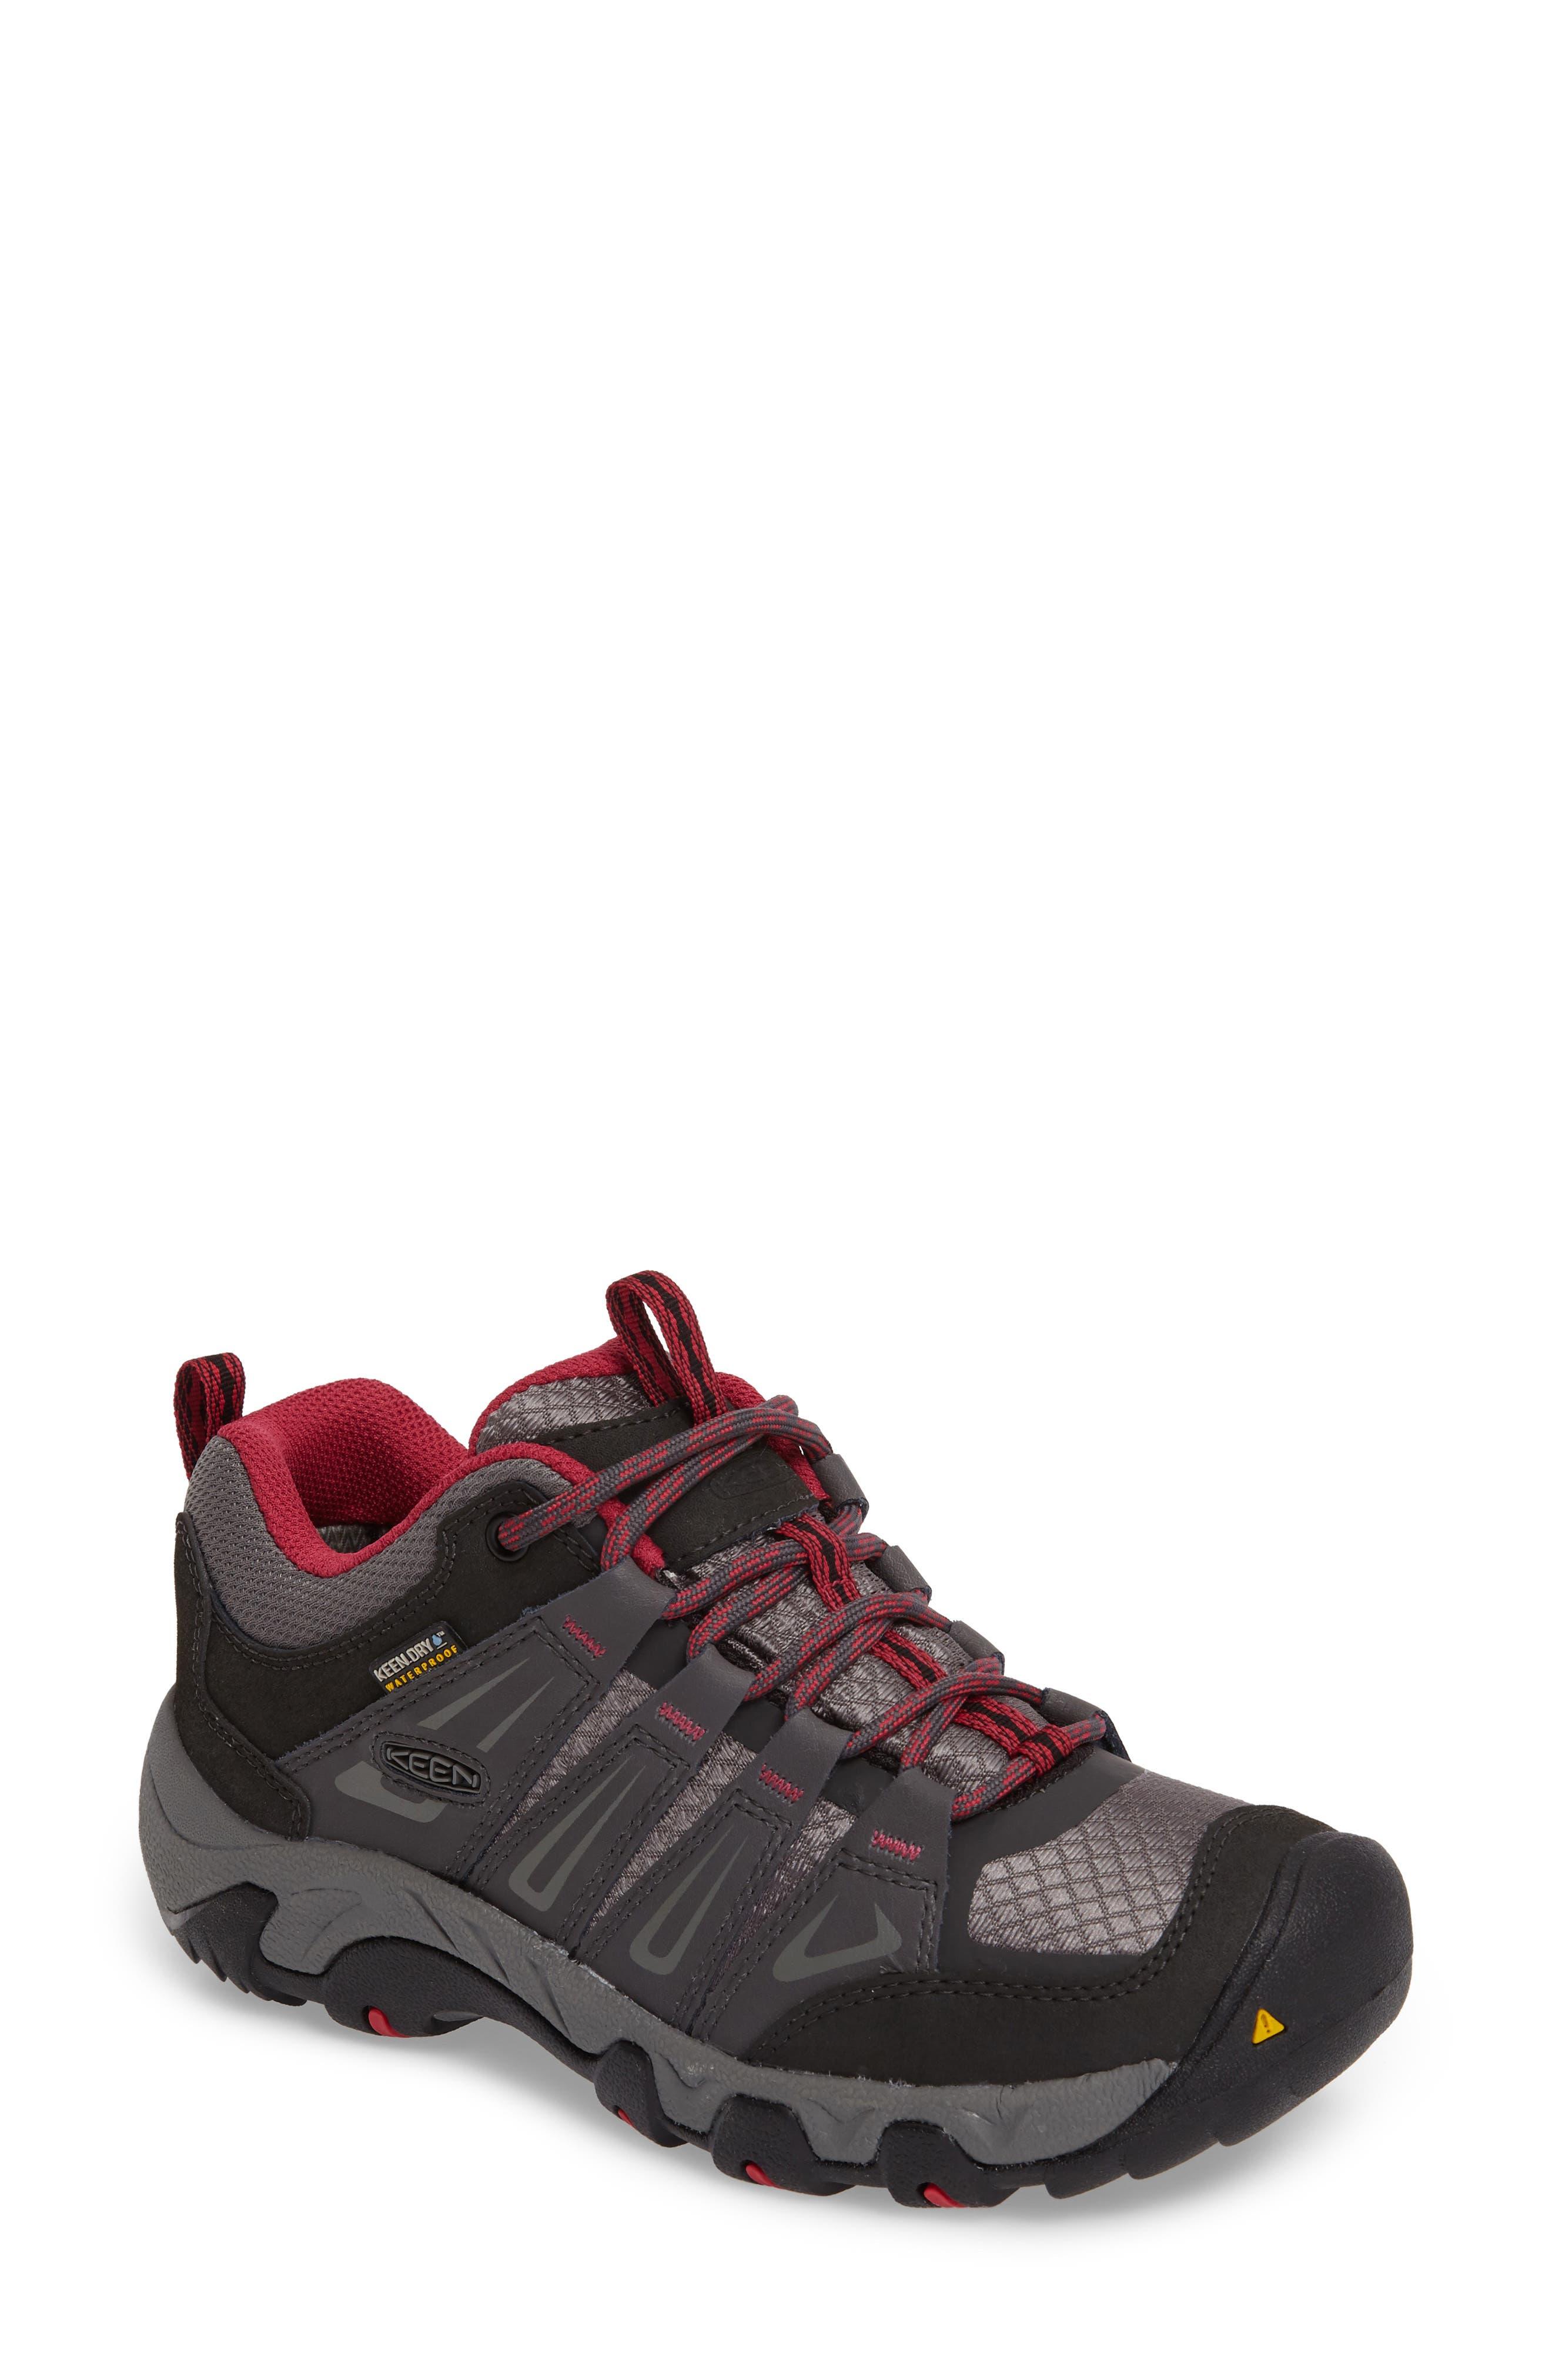 Main Image - Keen Oakridge Waterproof Hiking Shoe (Women)